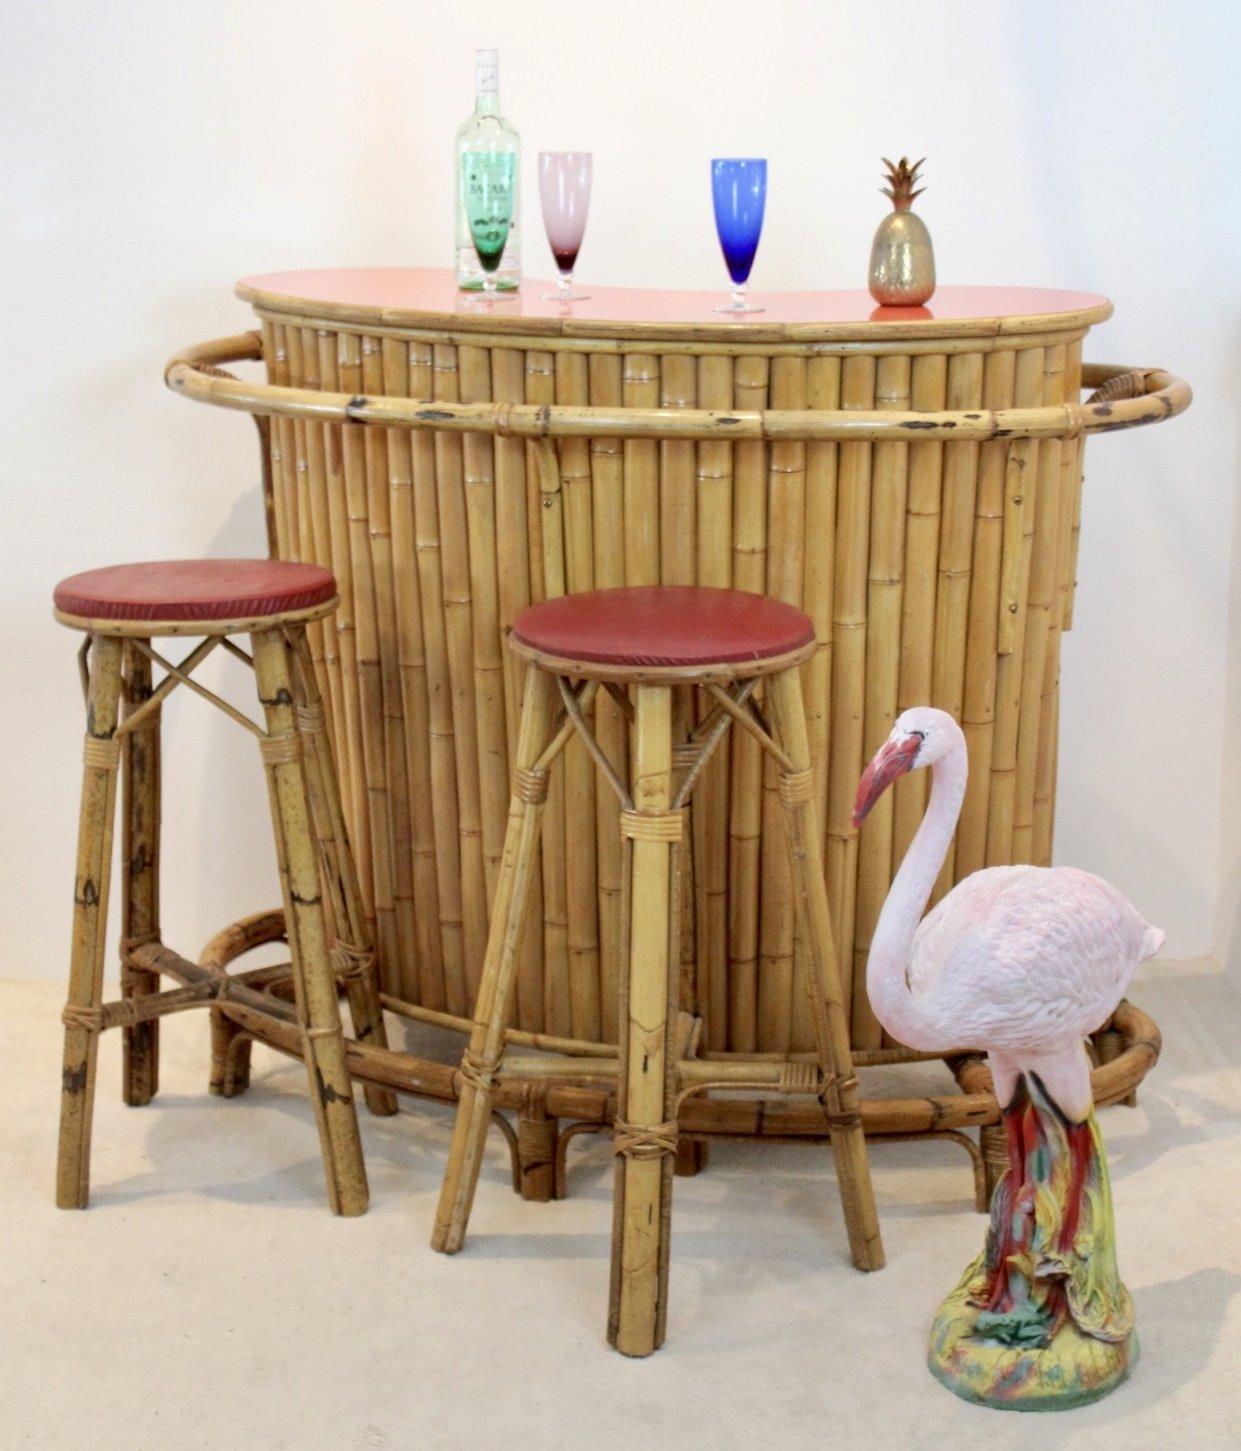 Chic Versatile French Mid Century Rattan Bamboo Tiki Bar With Stools 118440